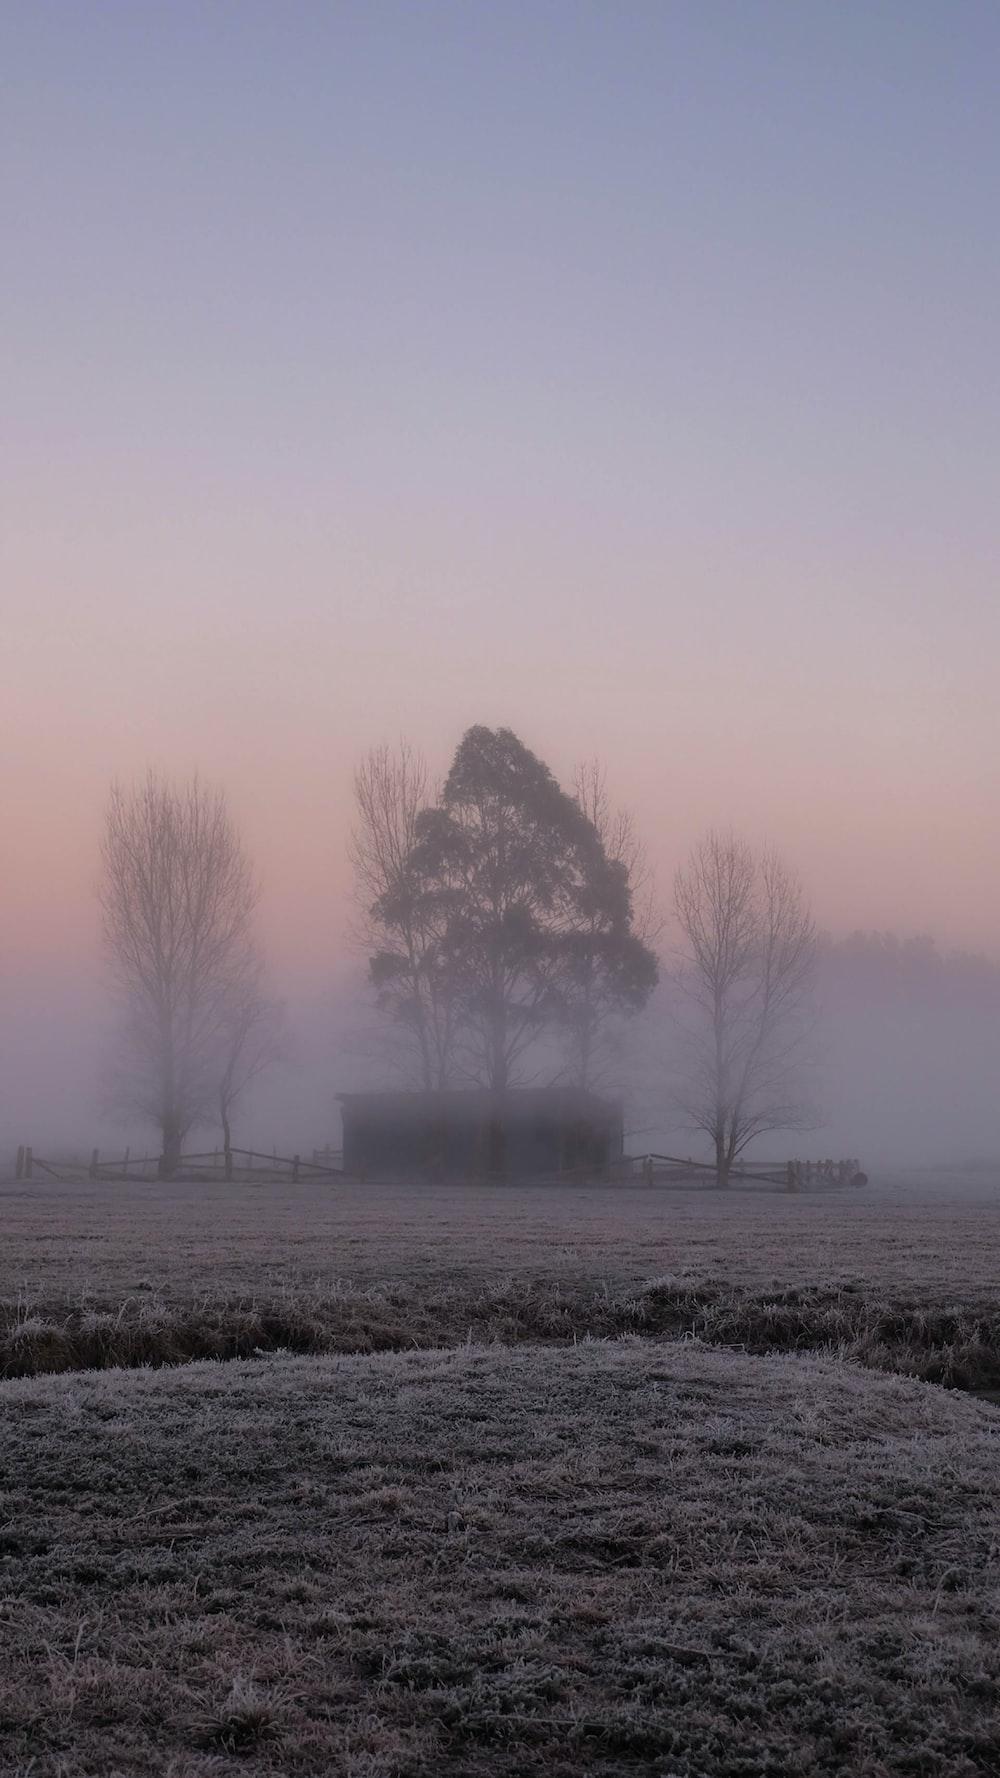 bare trees on field under gray sky